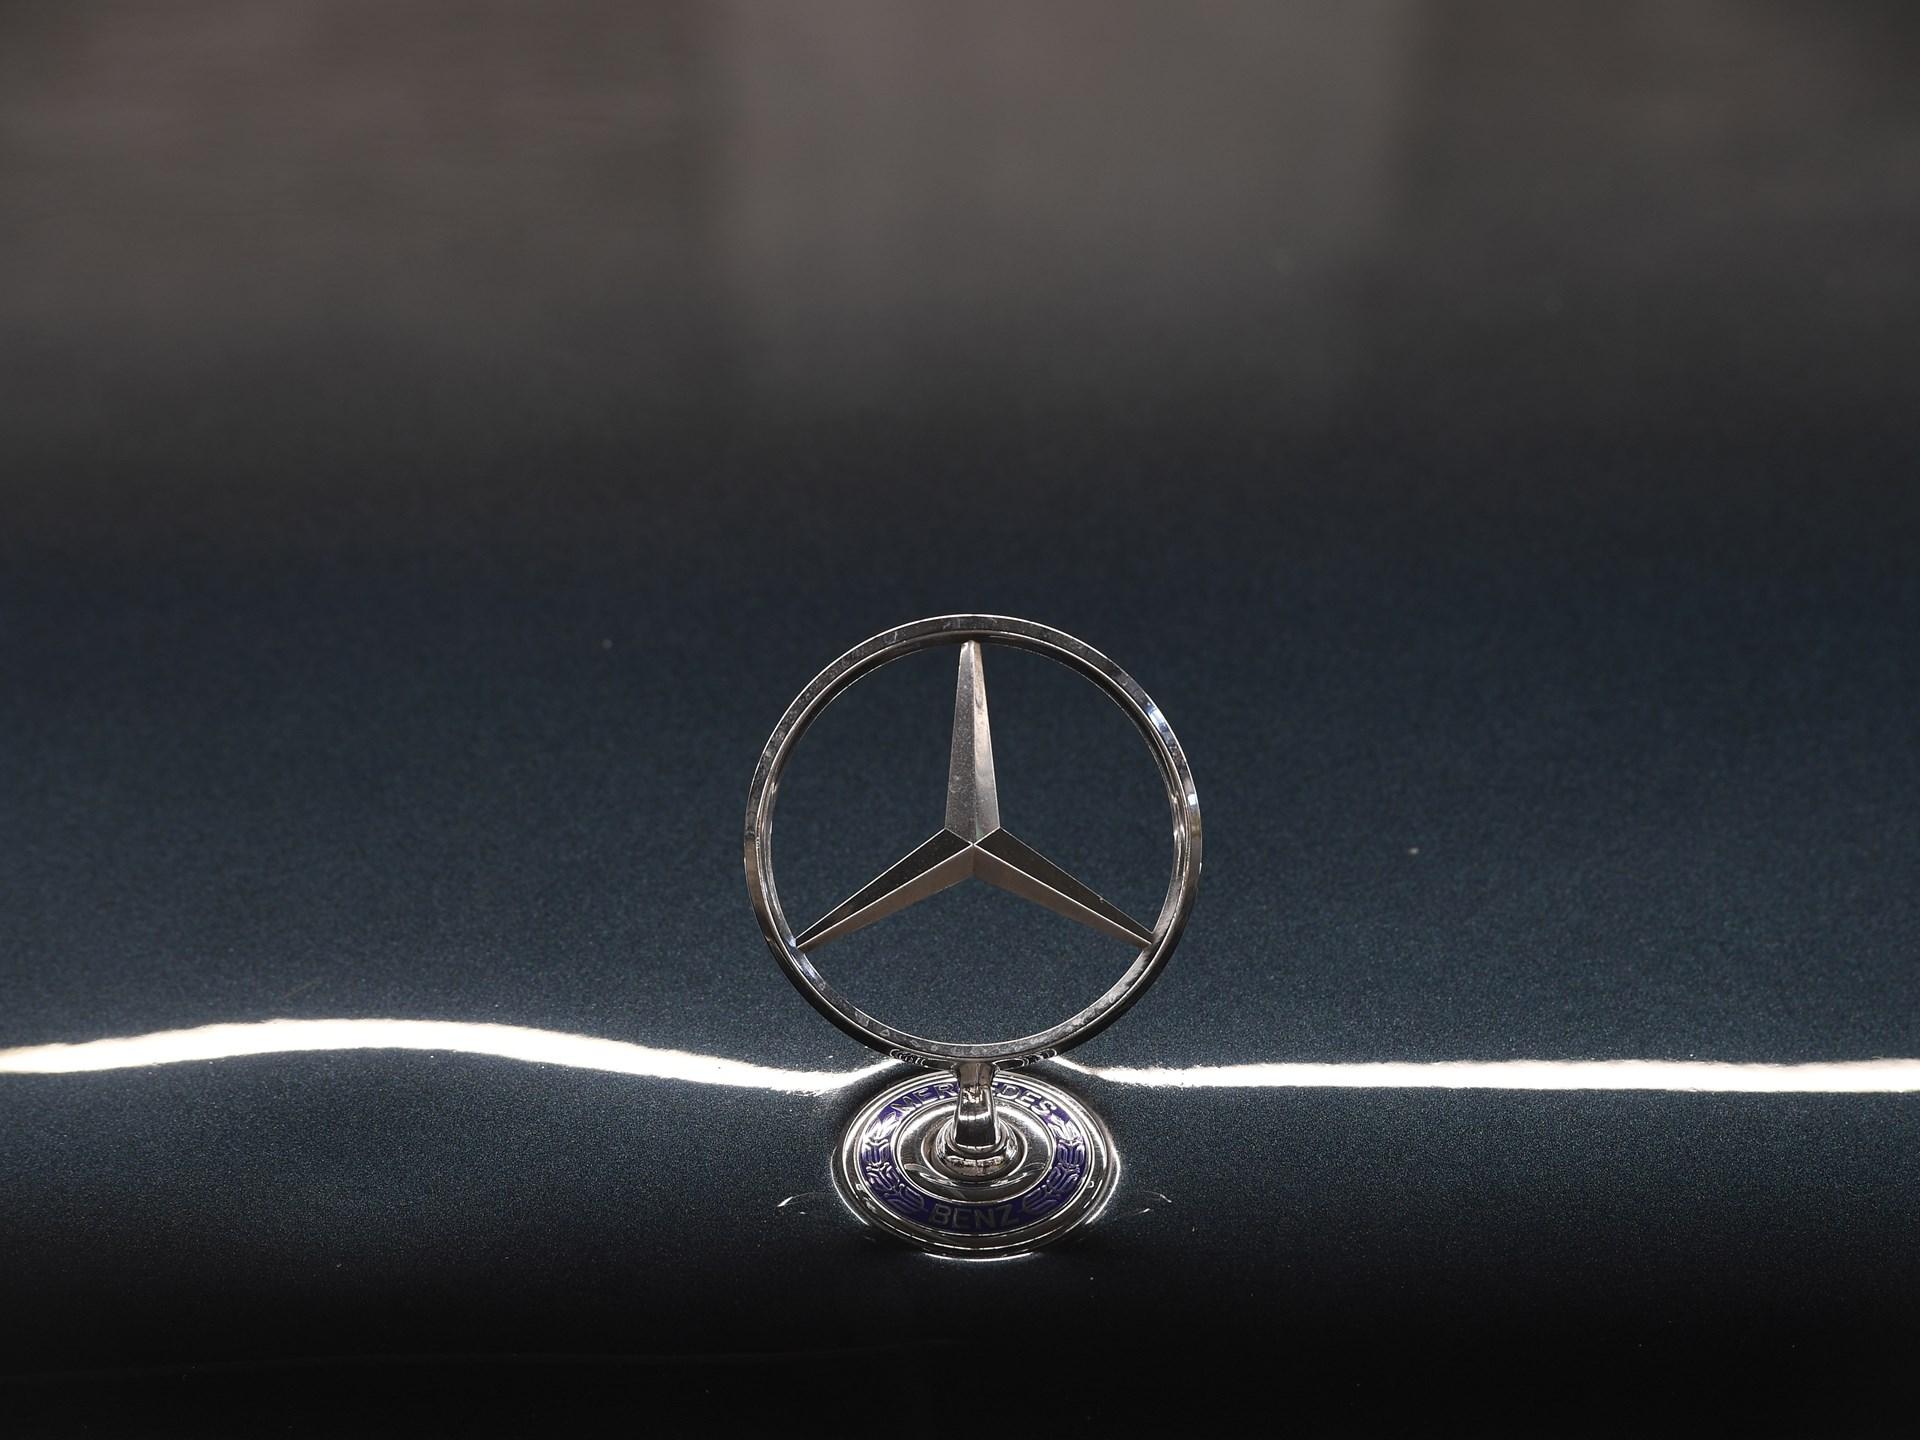 1994 Mercedes-Benz E 500 Limited